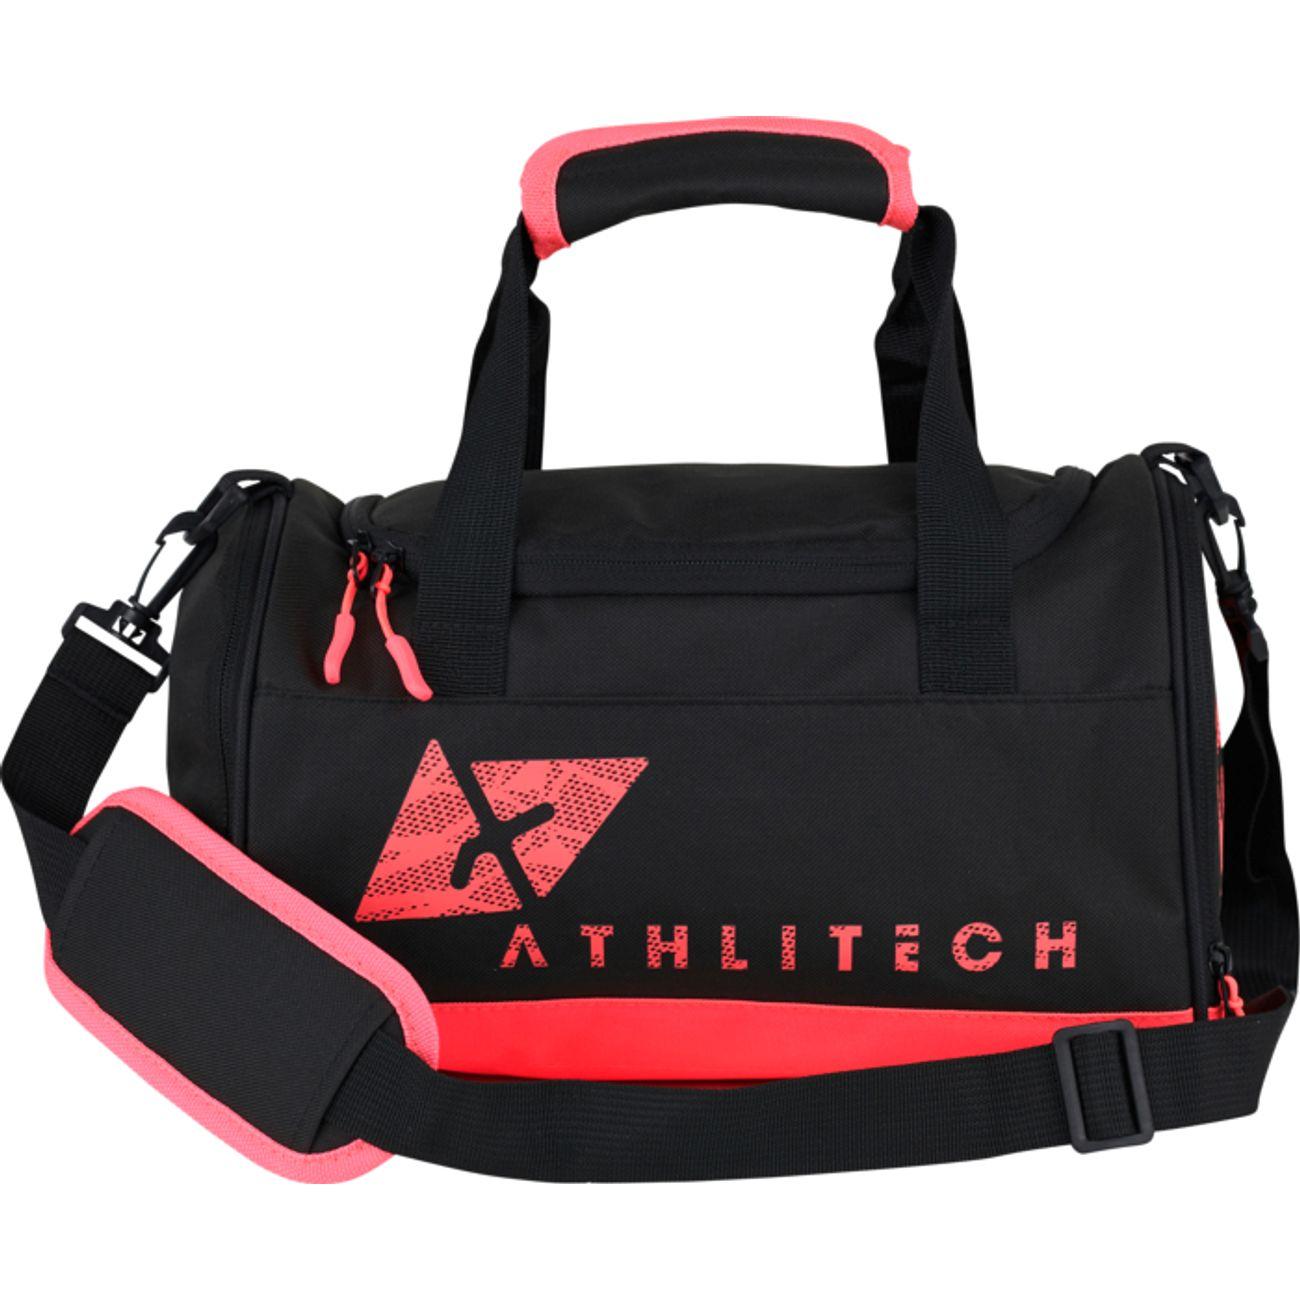 SAC DE SPORT Outdoor mixte ATHLITECH XS BAG 9